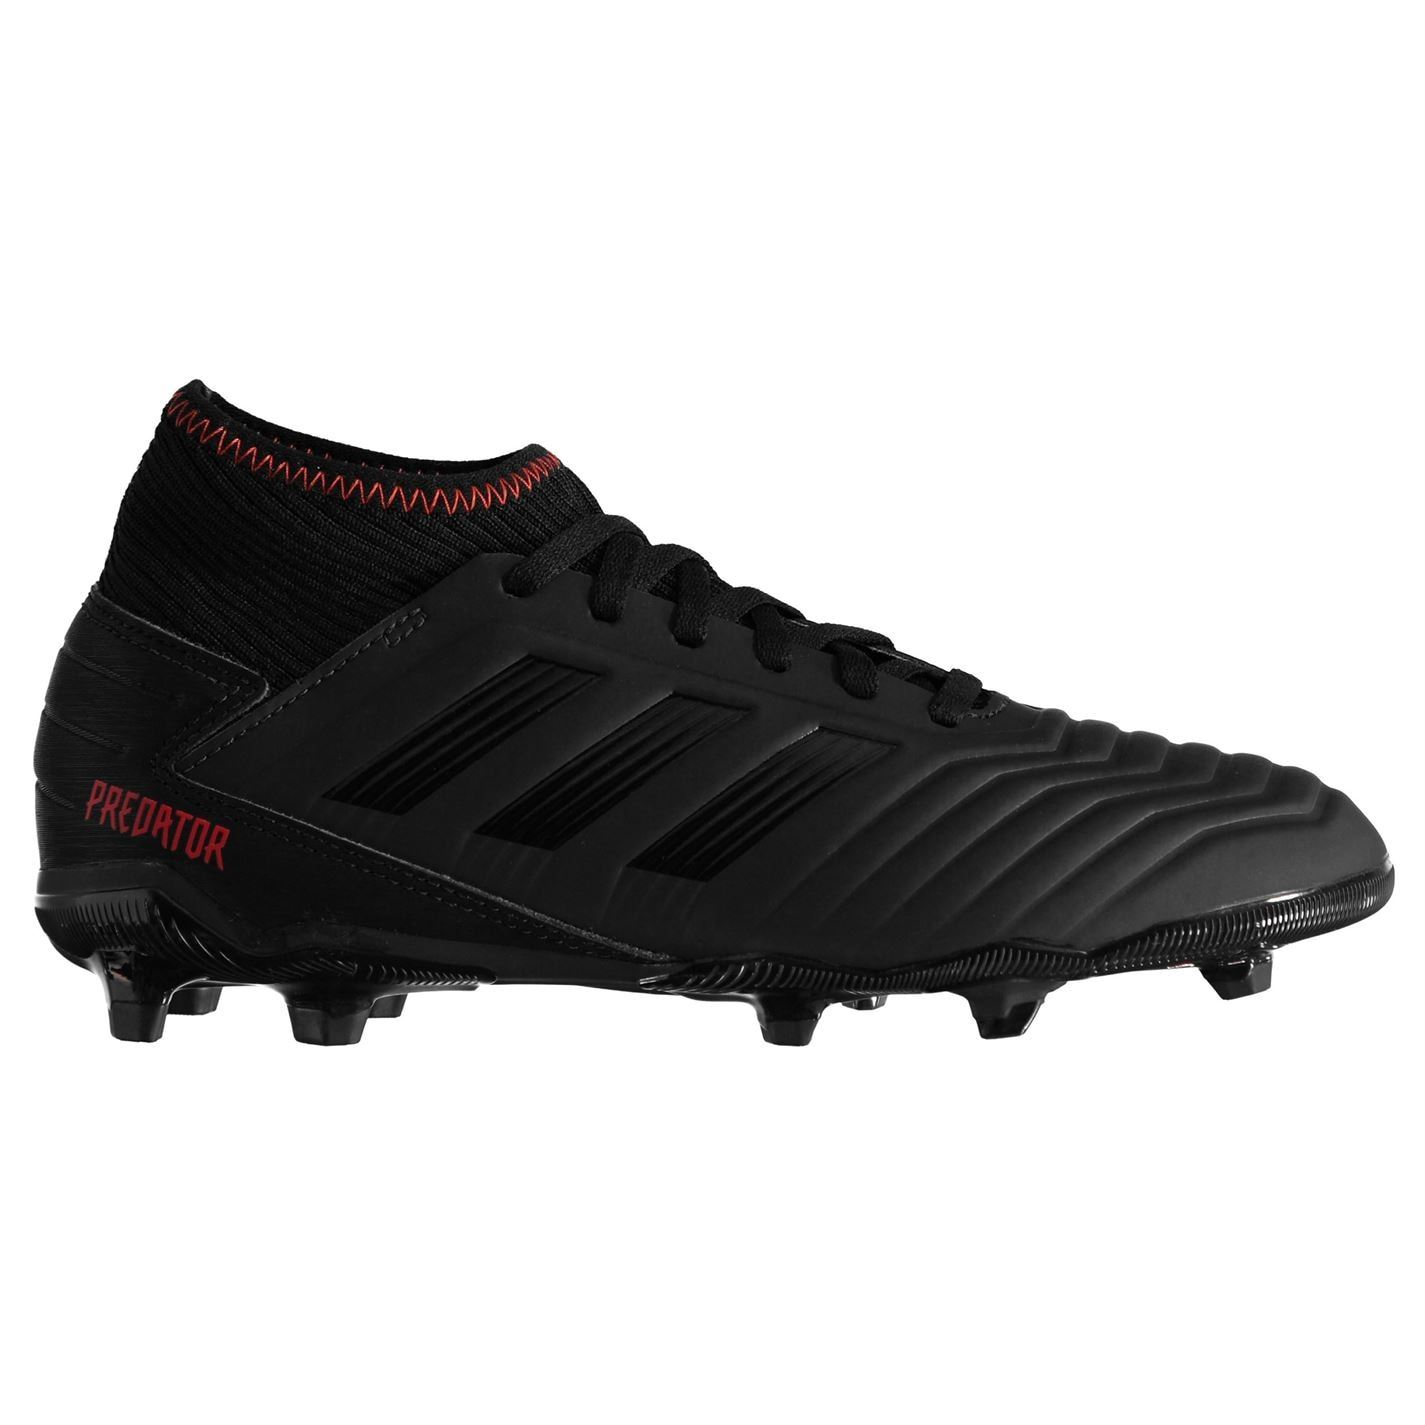 Adidas-Predator-Junior-19-3-FG-Firm-Ground-football-boots-Boys-Football-Chaussures miniature 3